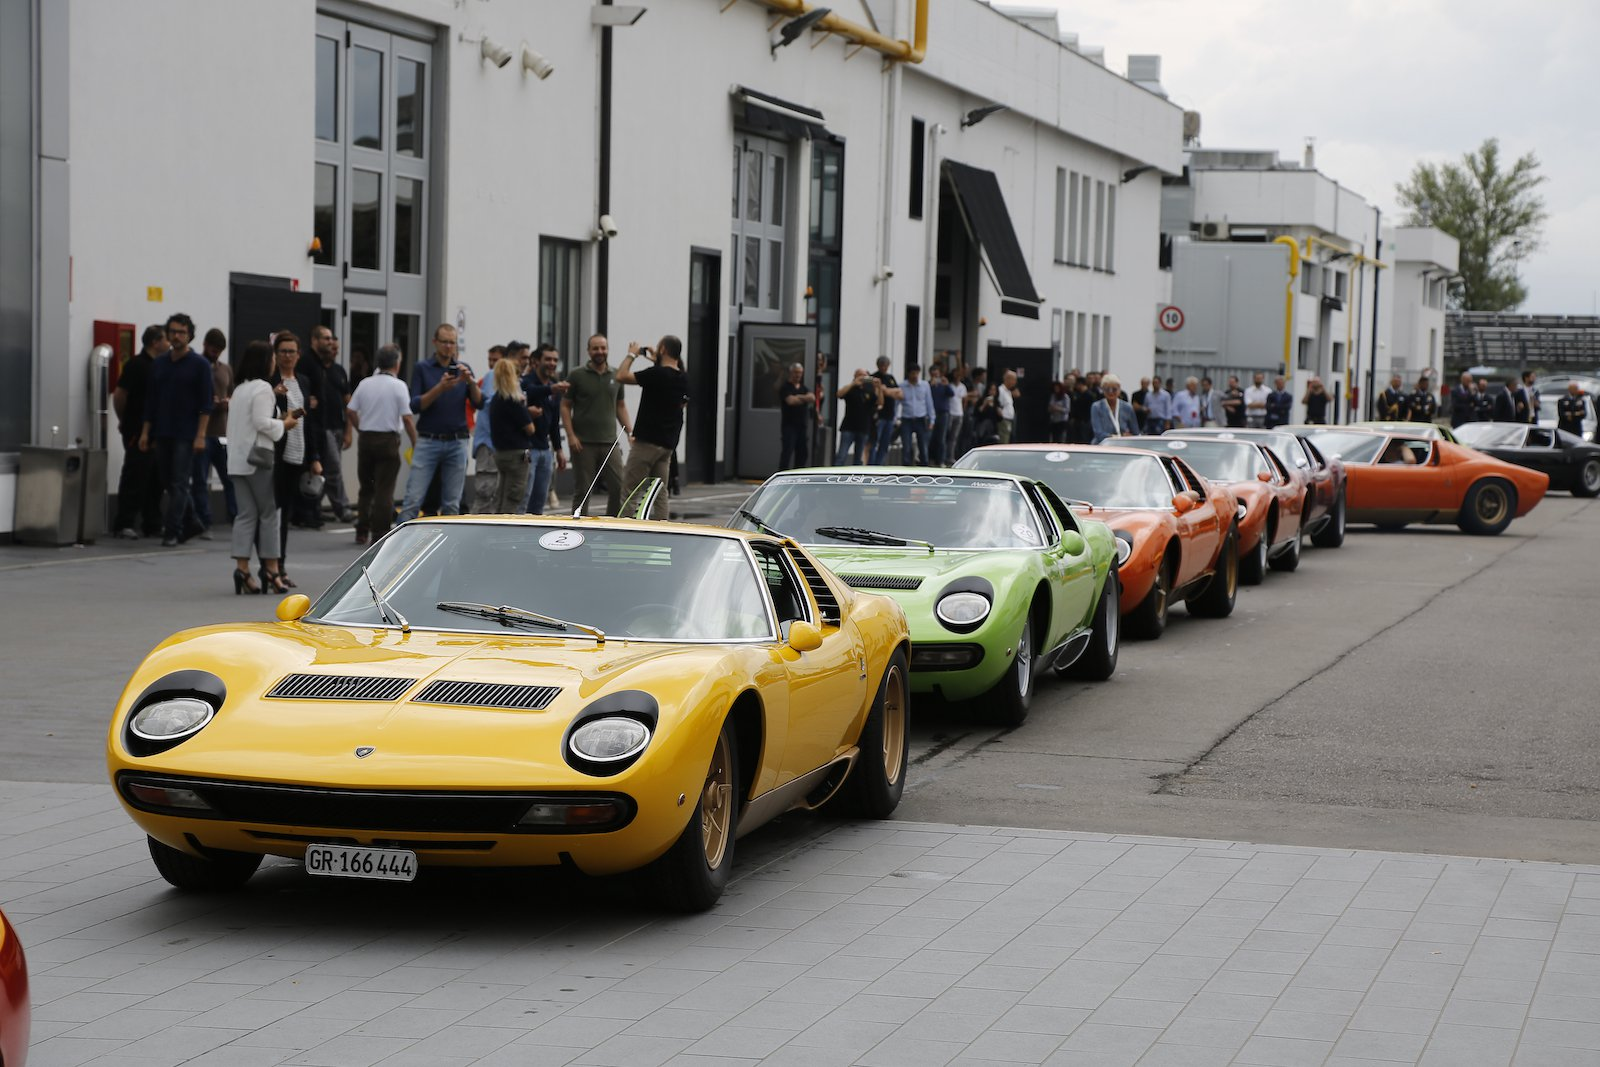 Lamborghini-Museum-Renovation-Miuras-12